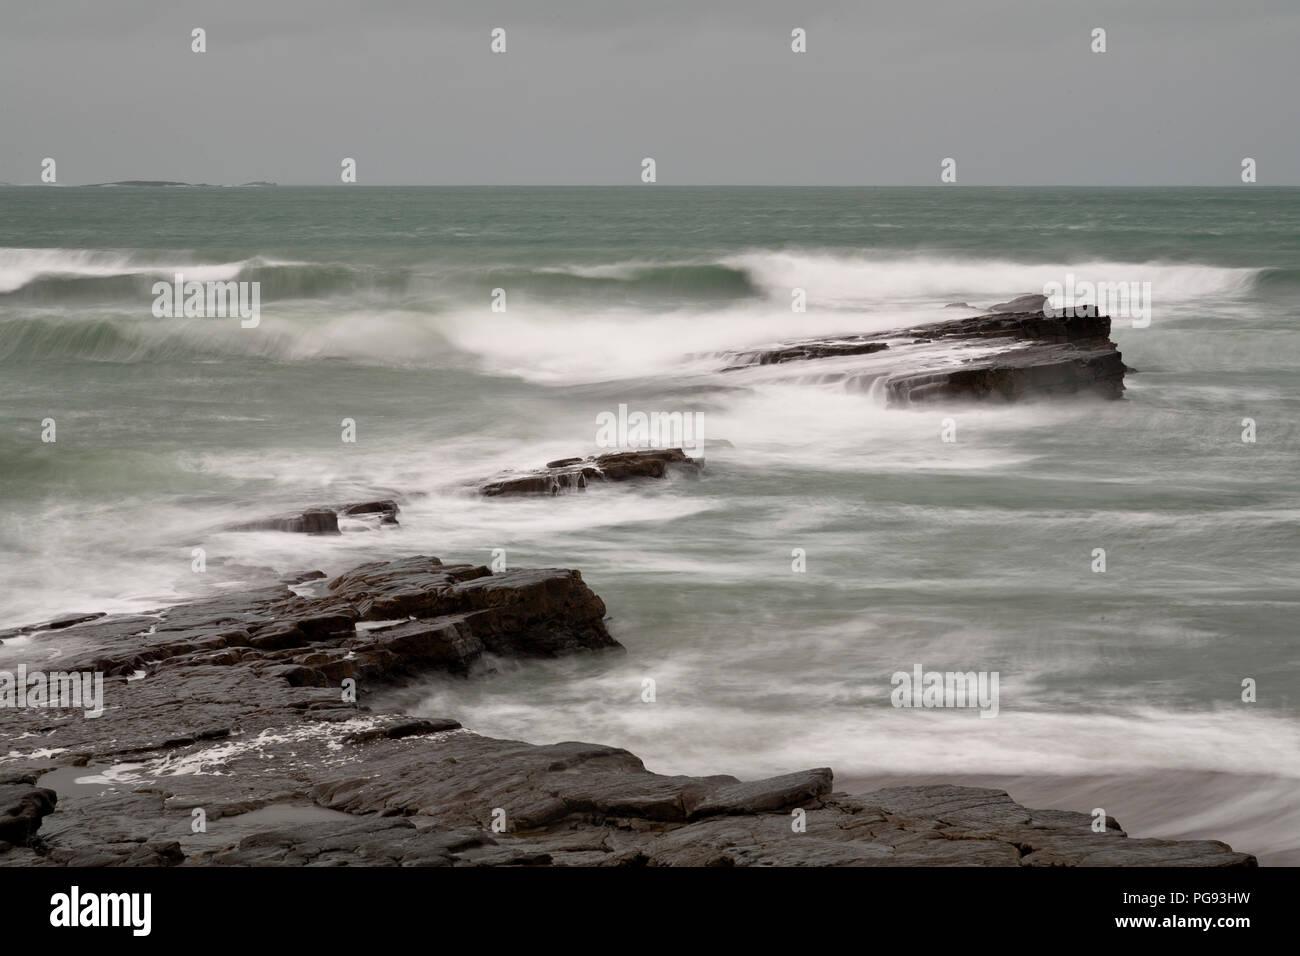 Breaking waves at Spanish Point on the west coast of Ireland - Stock Image